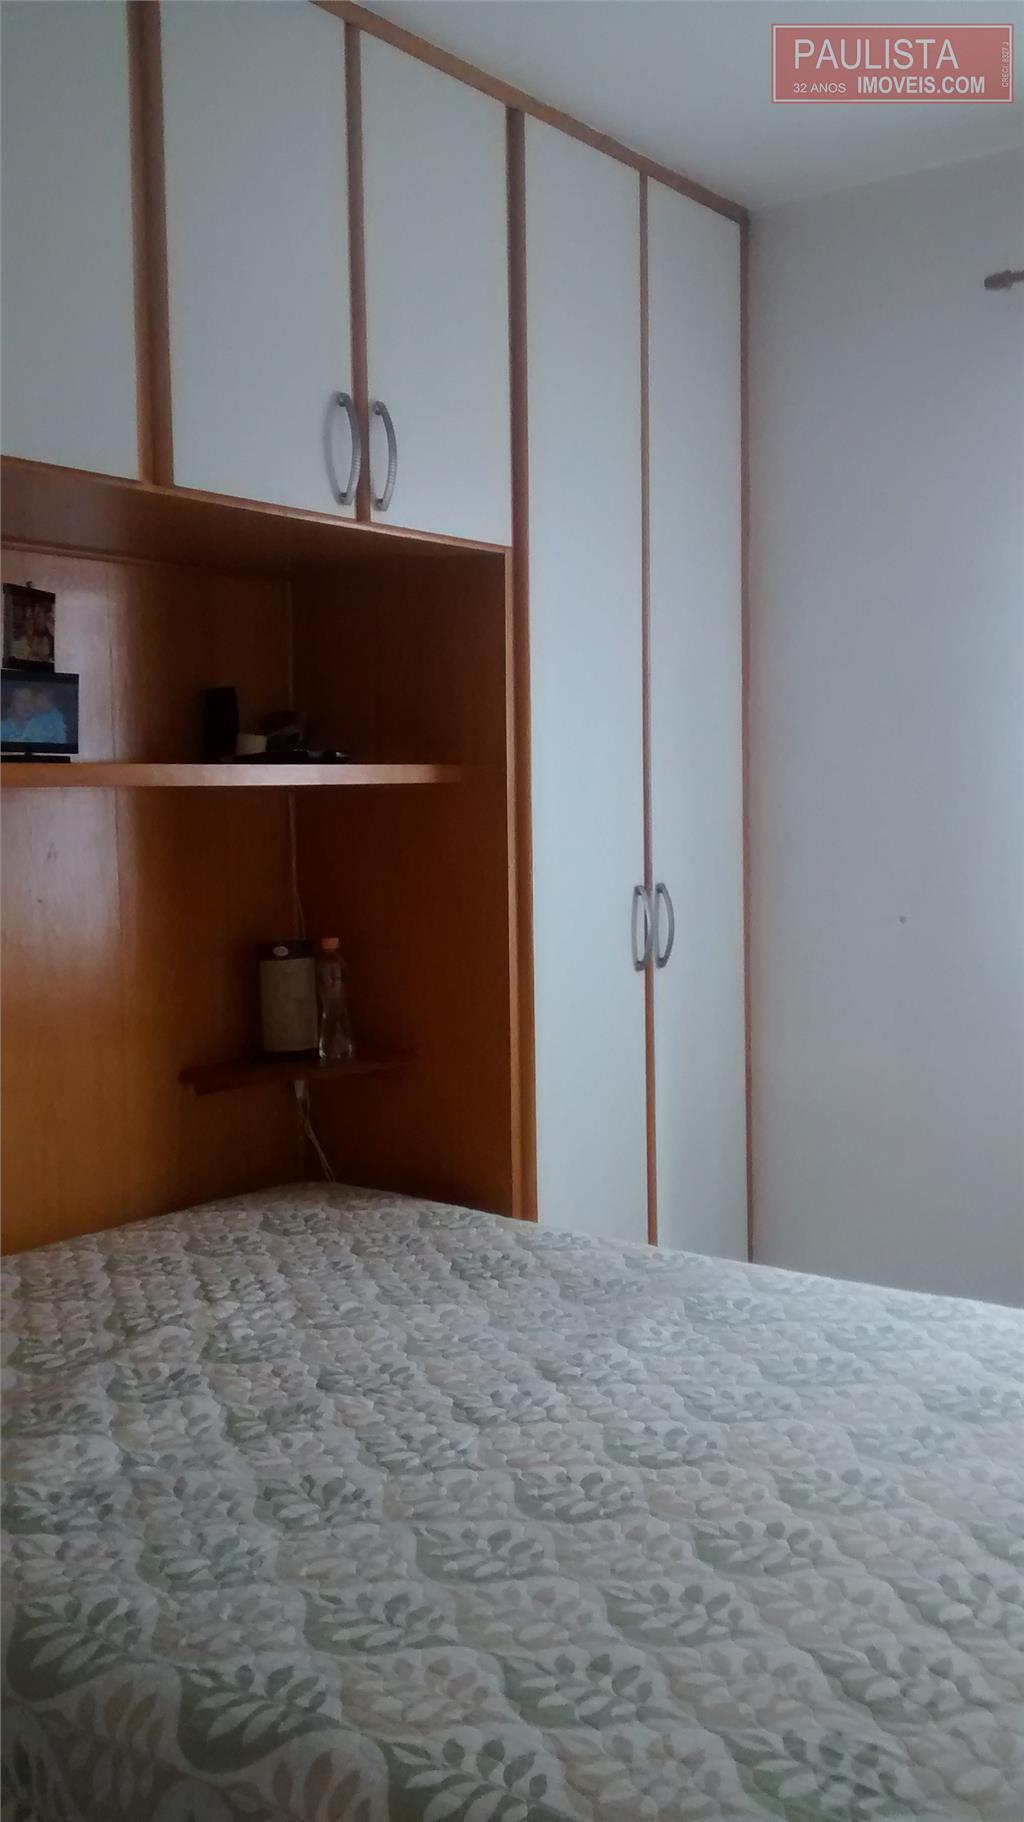 Apto 3 Dorm, Vila Mascote, São Paulo (AP8281) - Foto 8